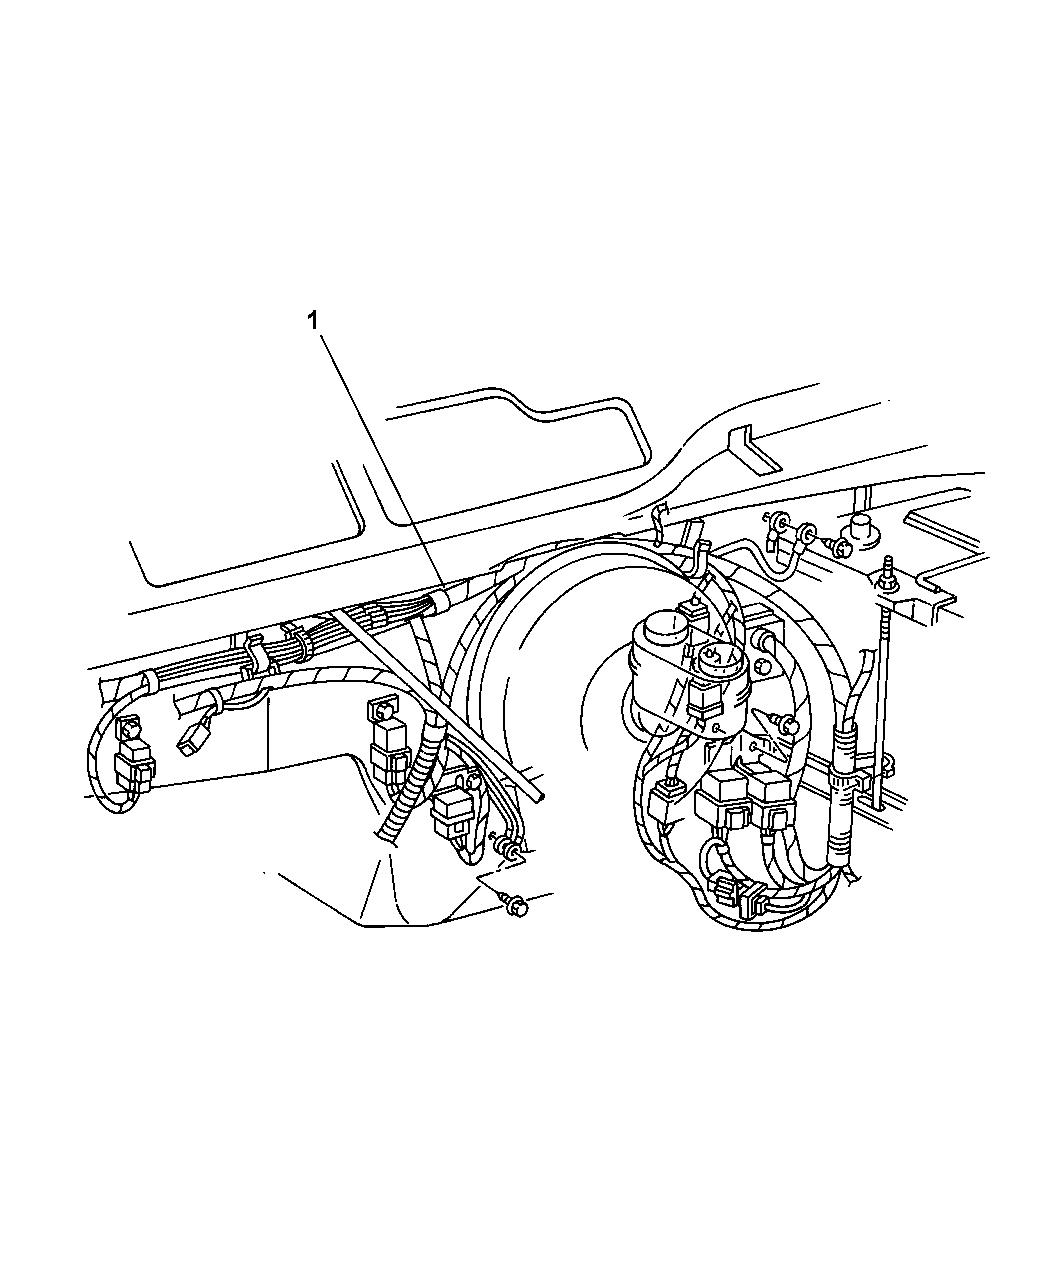 2003 Jeep Liberty Wiring - Headlamp & Dash